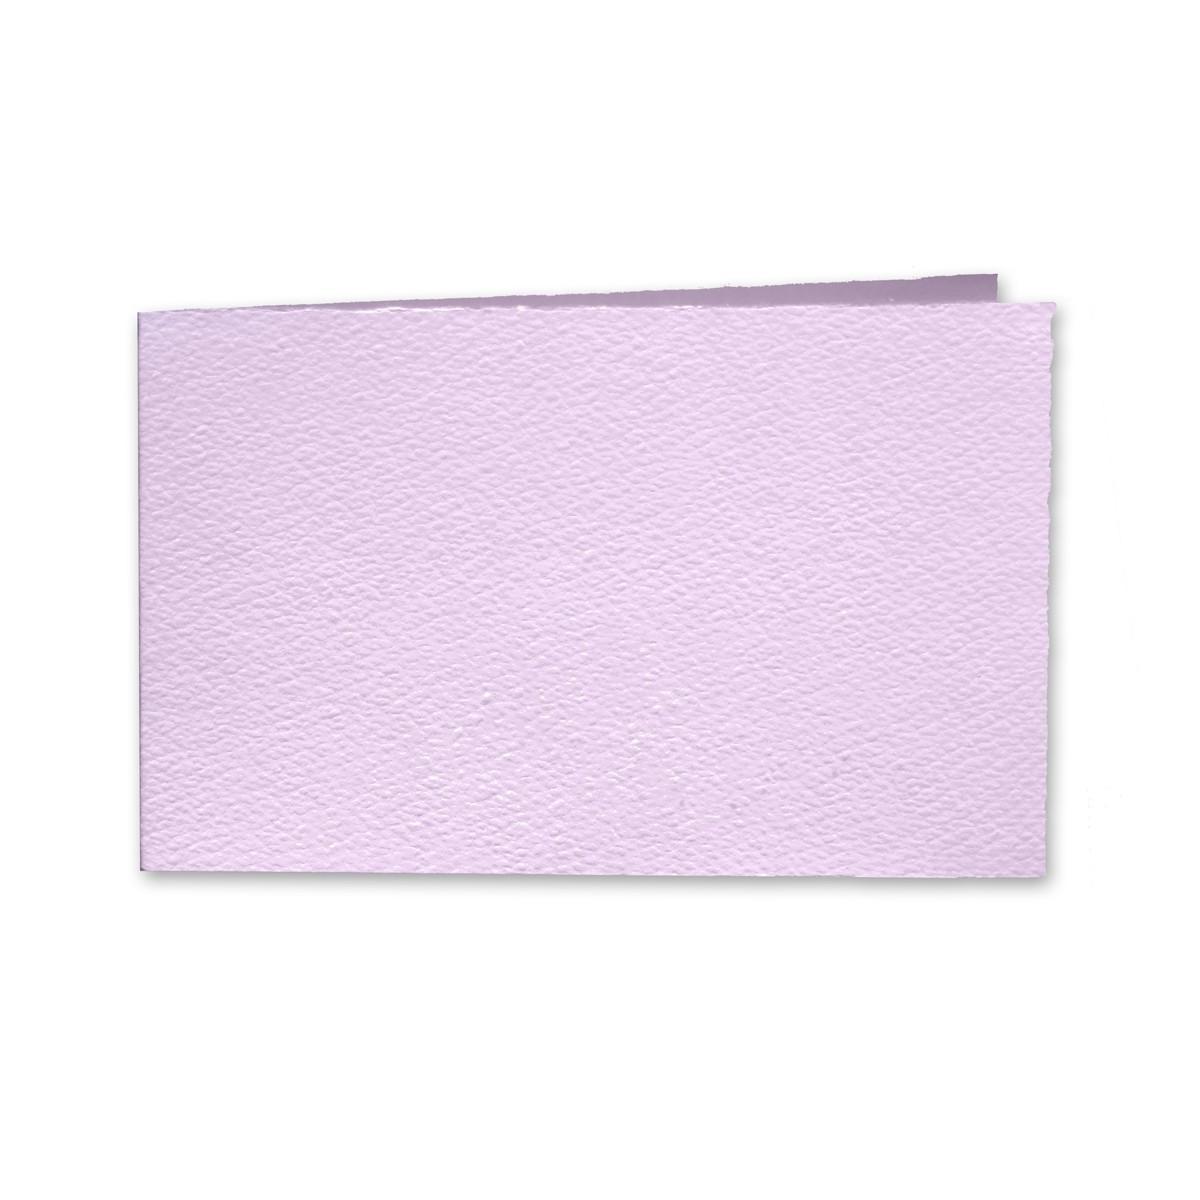 "Arturo Lavender Album Foldovers (600AC) 97# Cover (4.53"" x 13.39"" open size) Pack of 50"